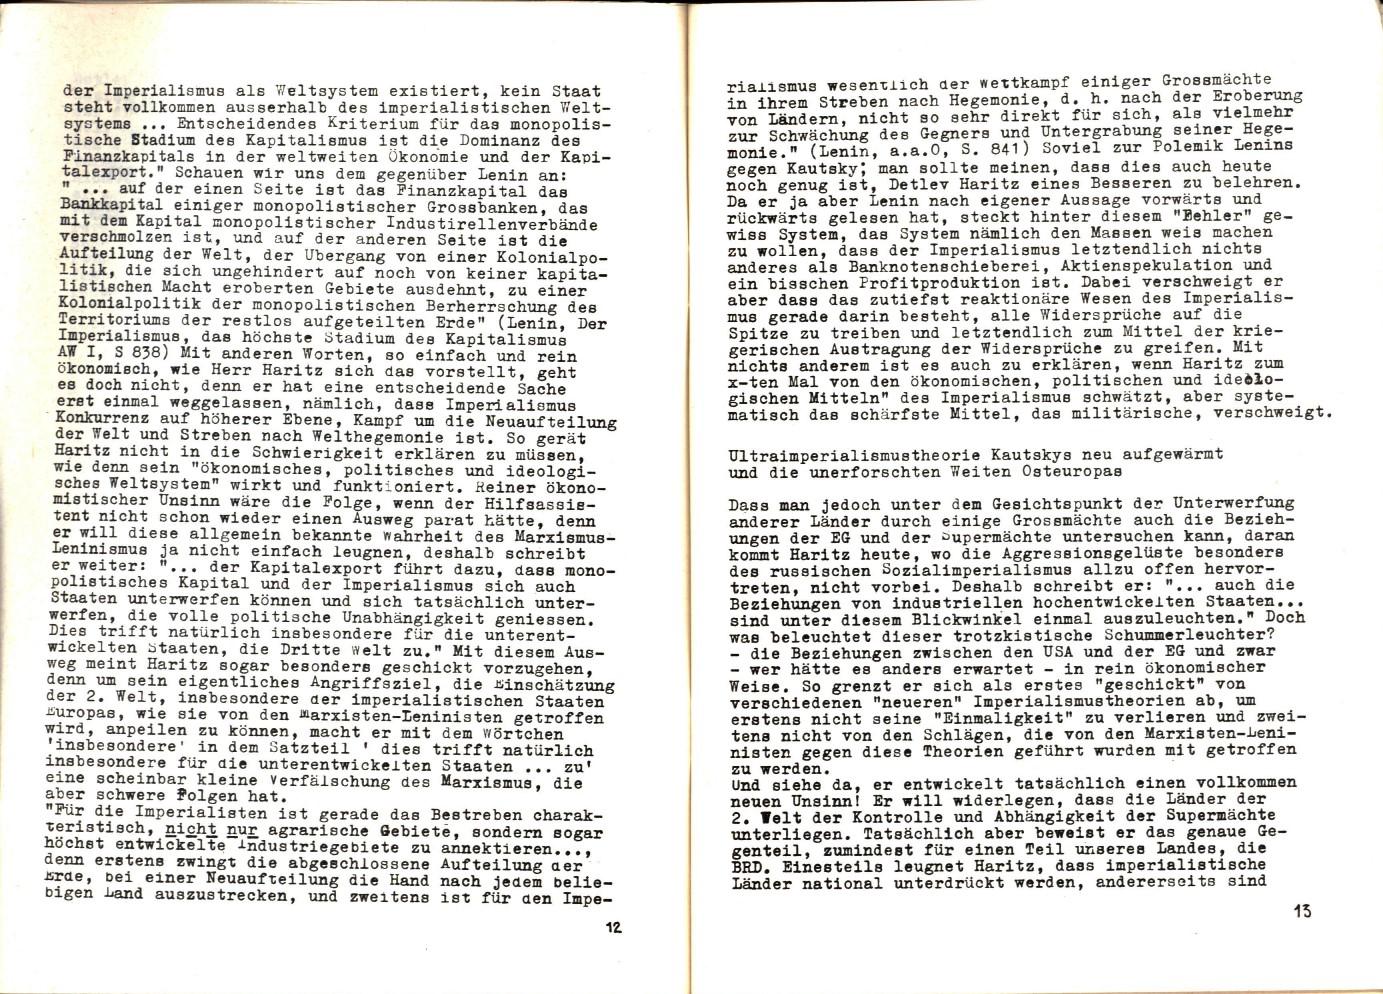 Berlin_KSV_1975_Dokumente_der_SAZ_08